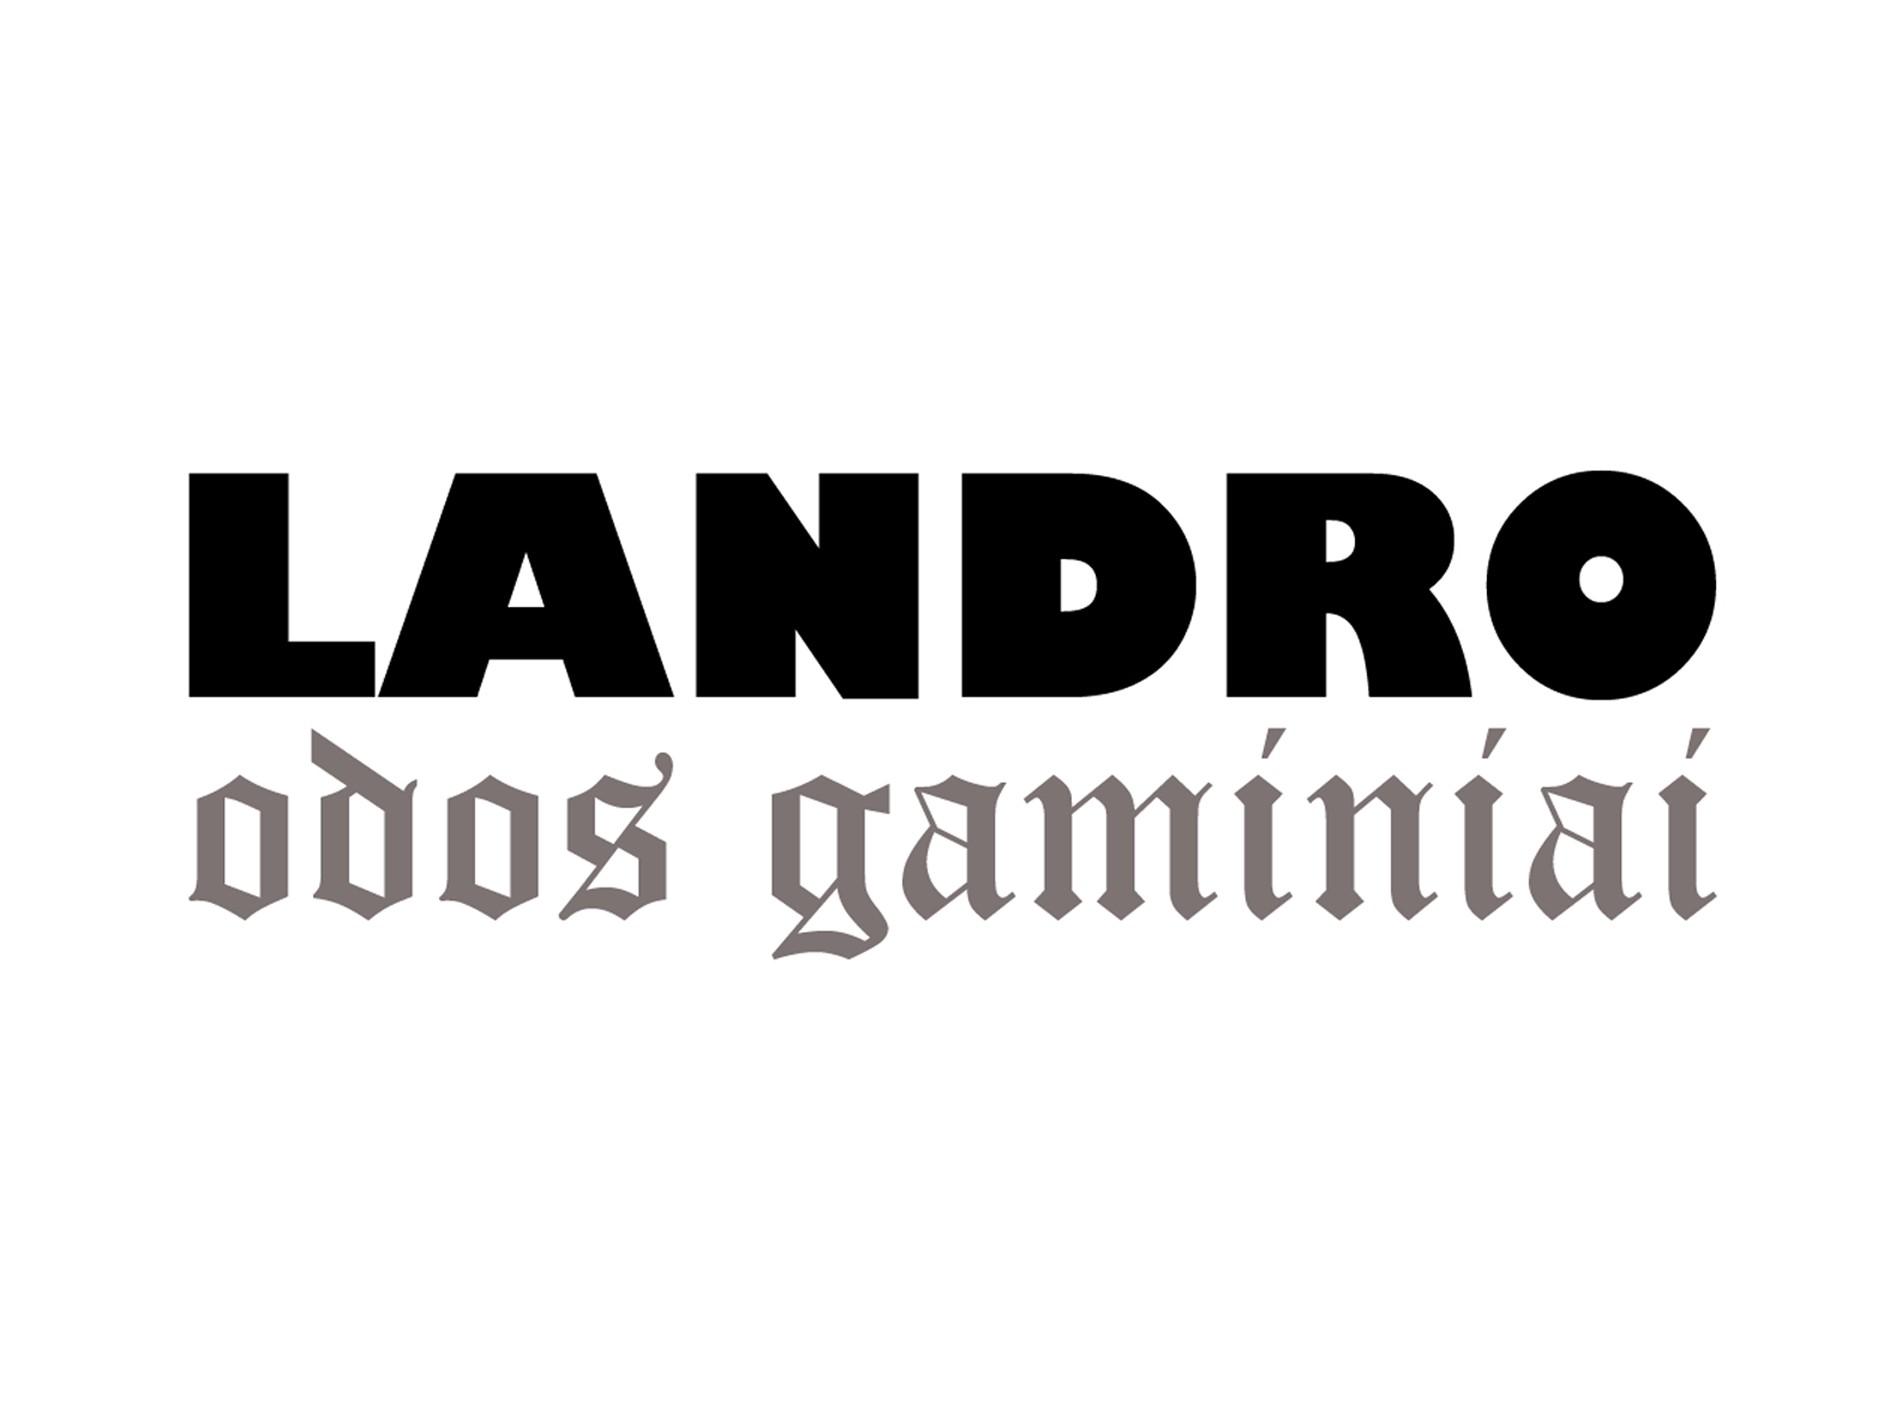 Landro